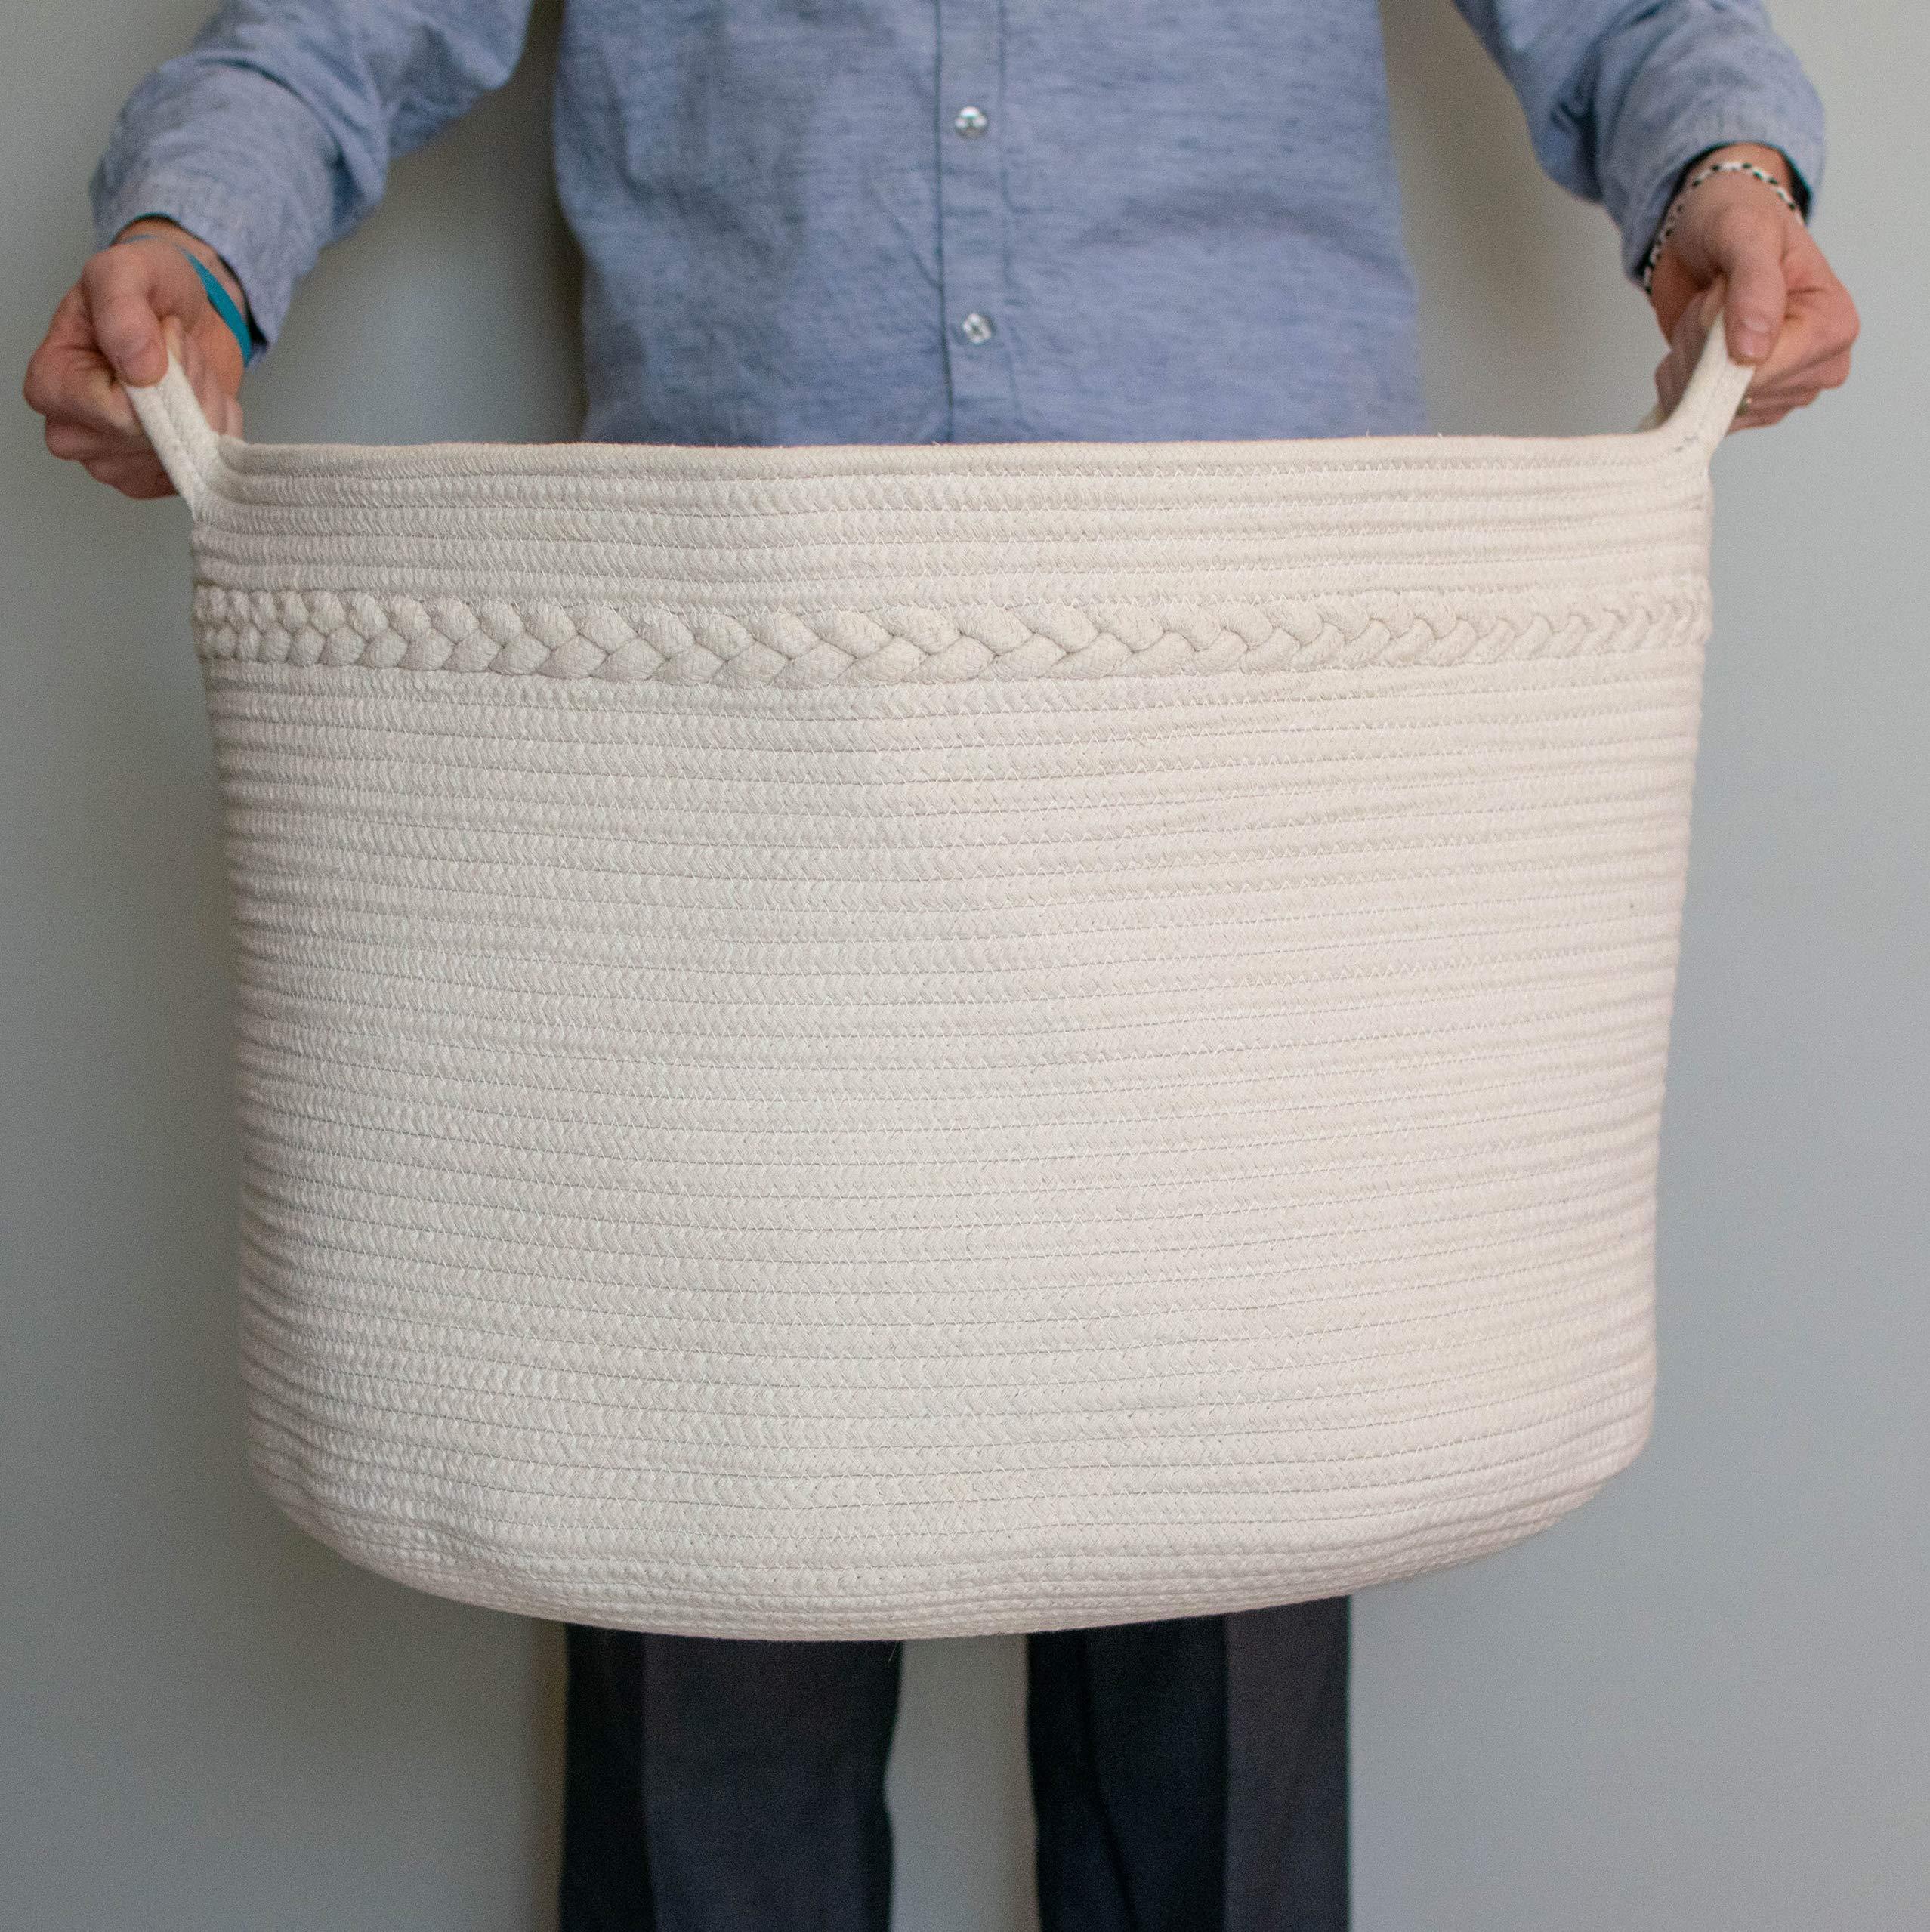 Relodecor XXL Cotton Rope Basket - 22'' X 22'' X 14'' Woven Laundry Basket | Blanket Basket and Toy Storage Basket